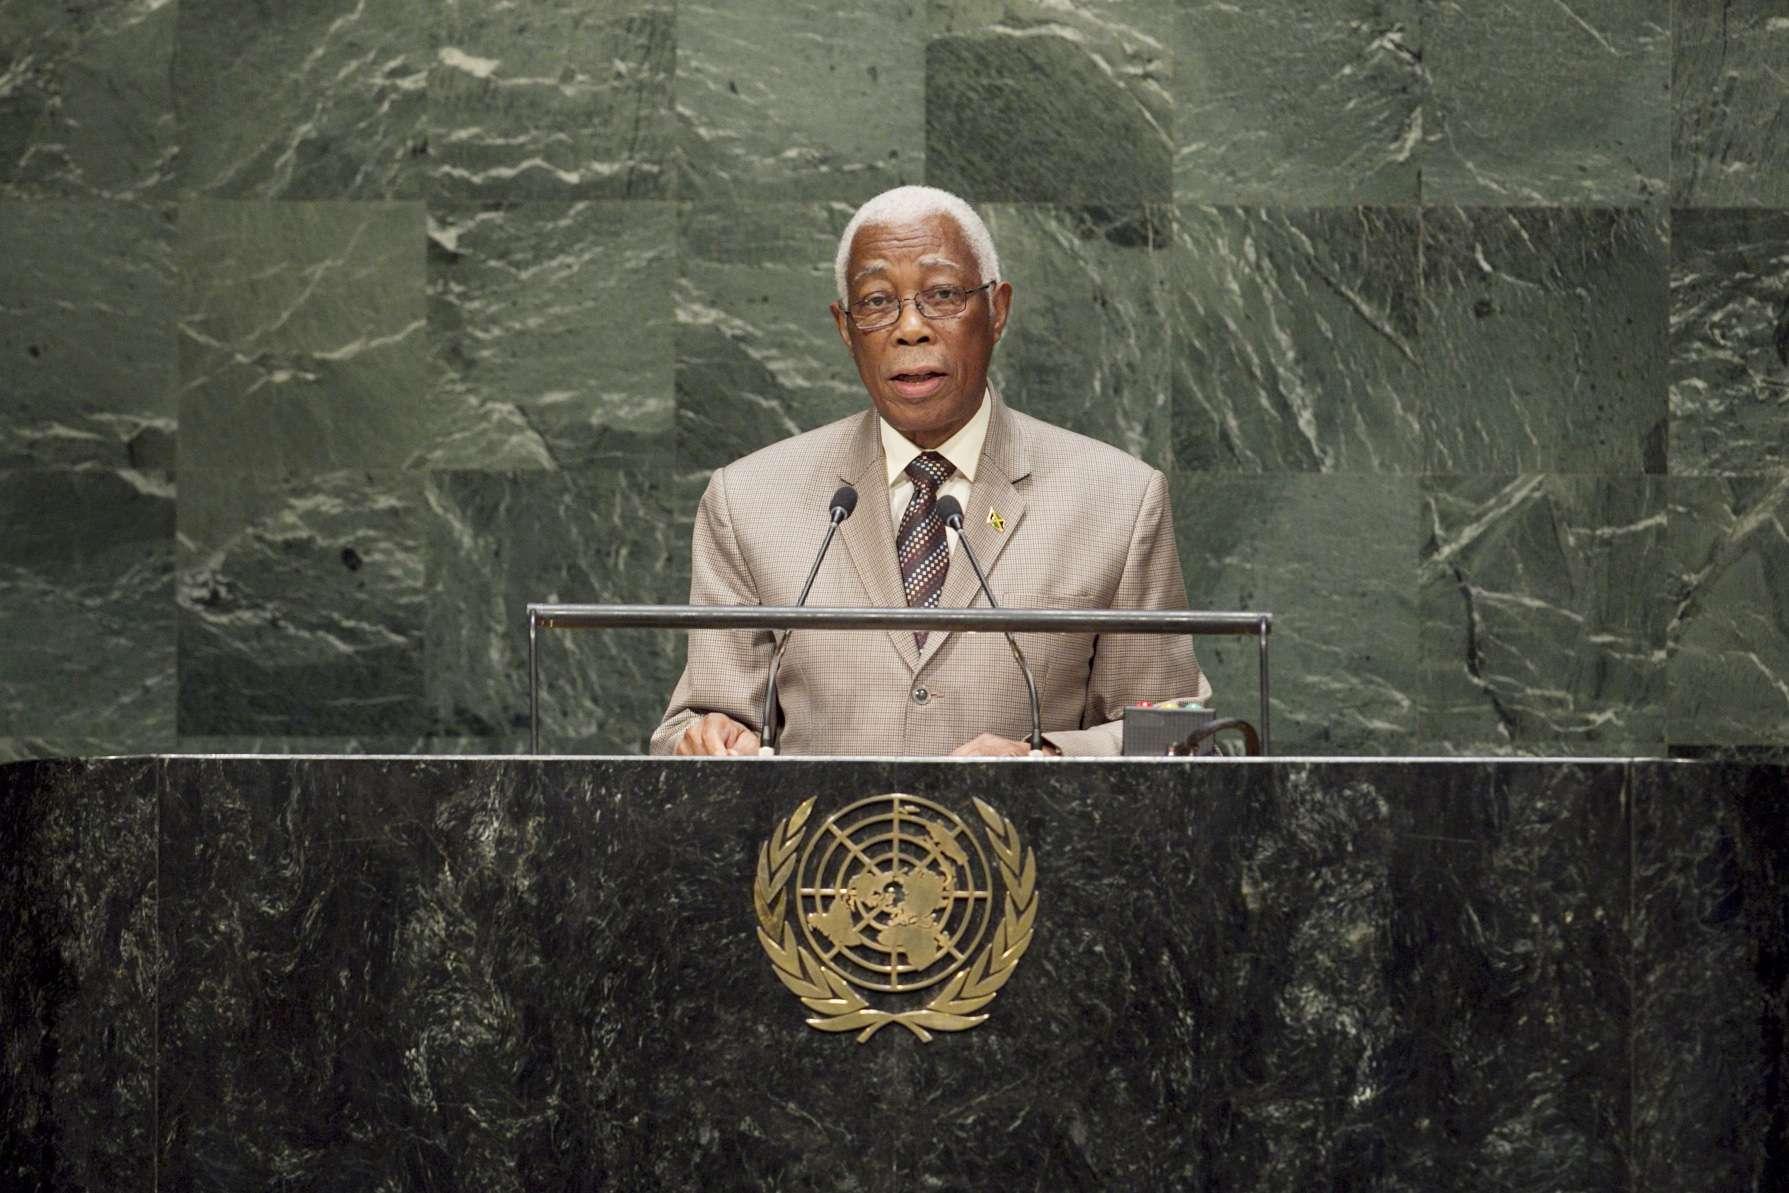 Ja on SDGs – 'It Will Be Difficult'